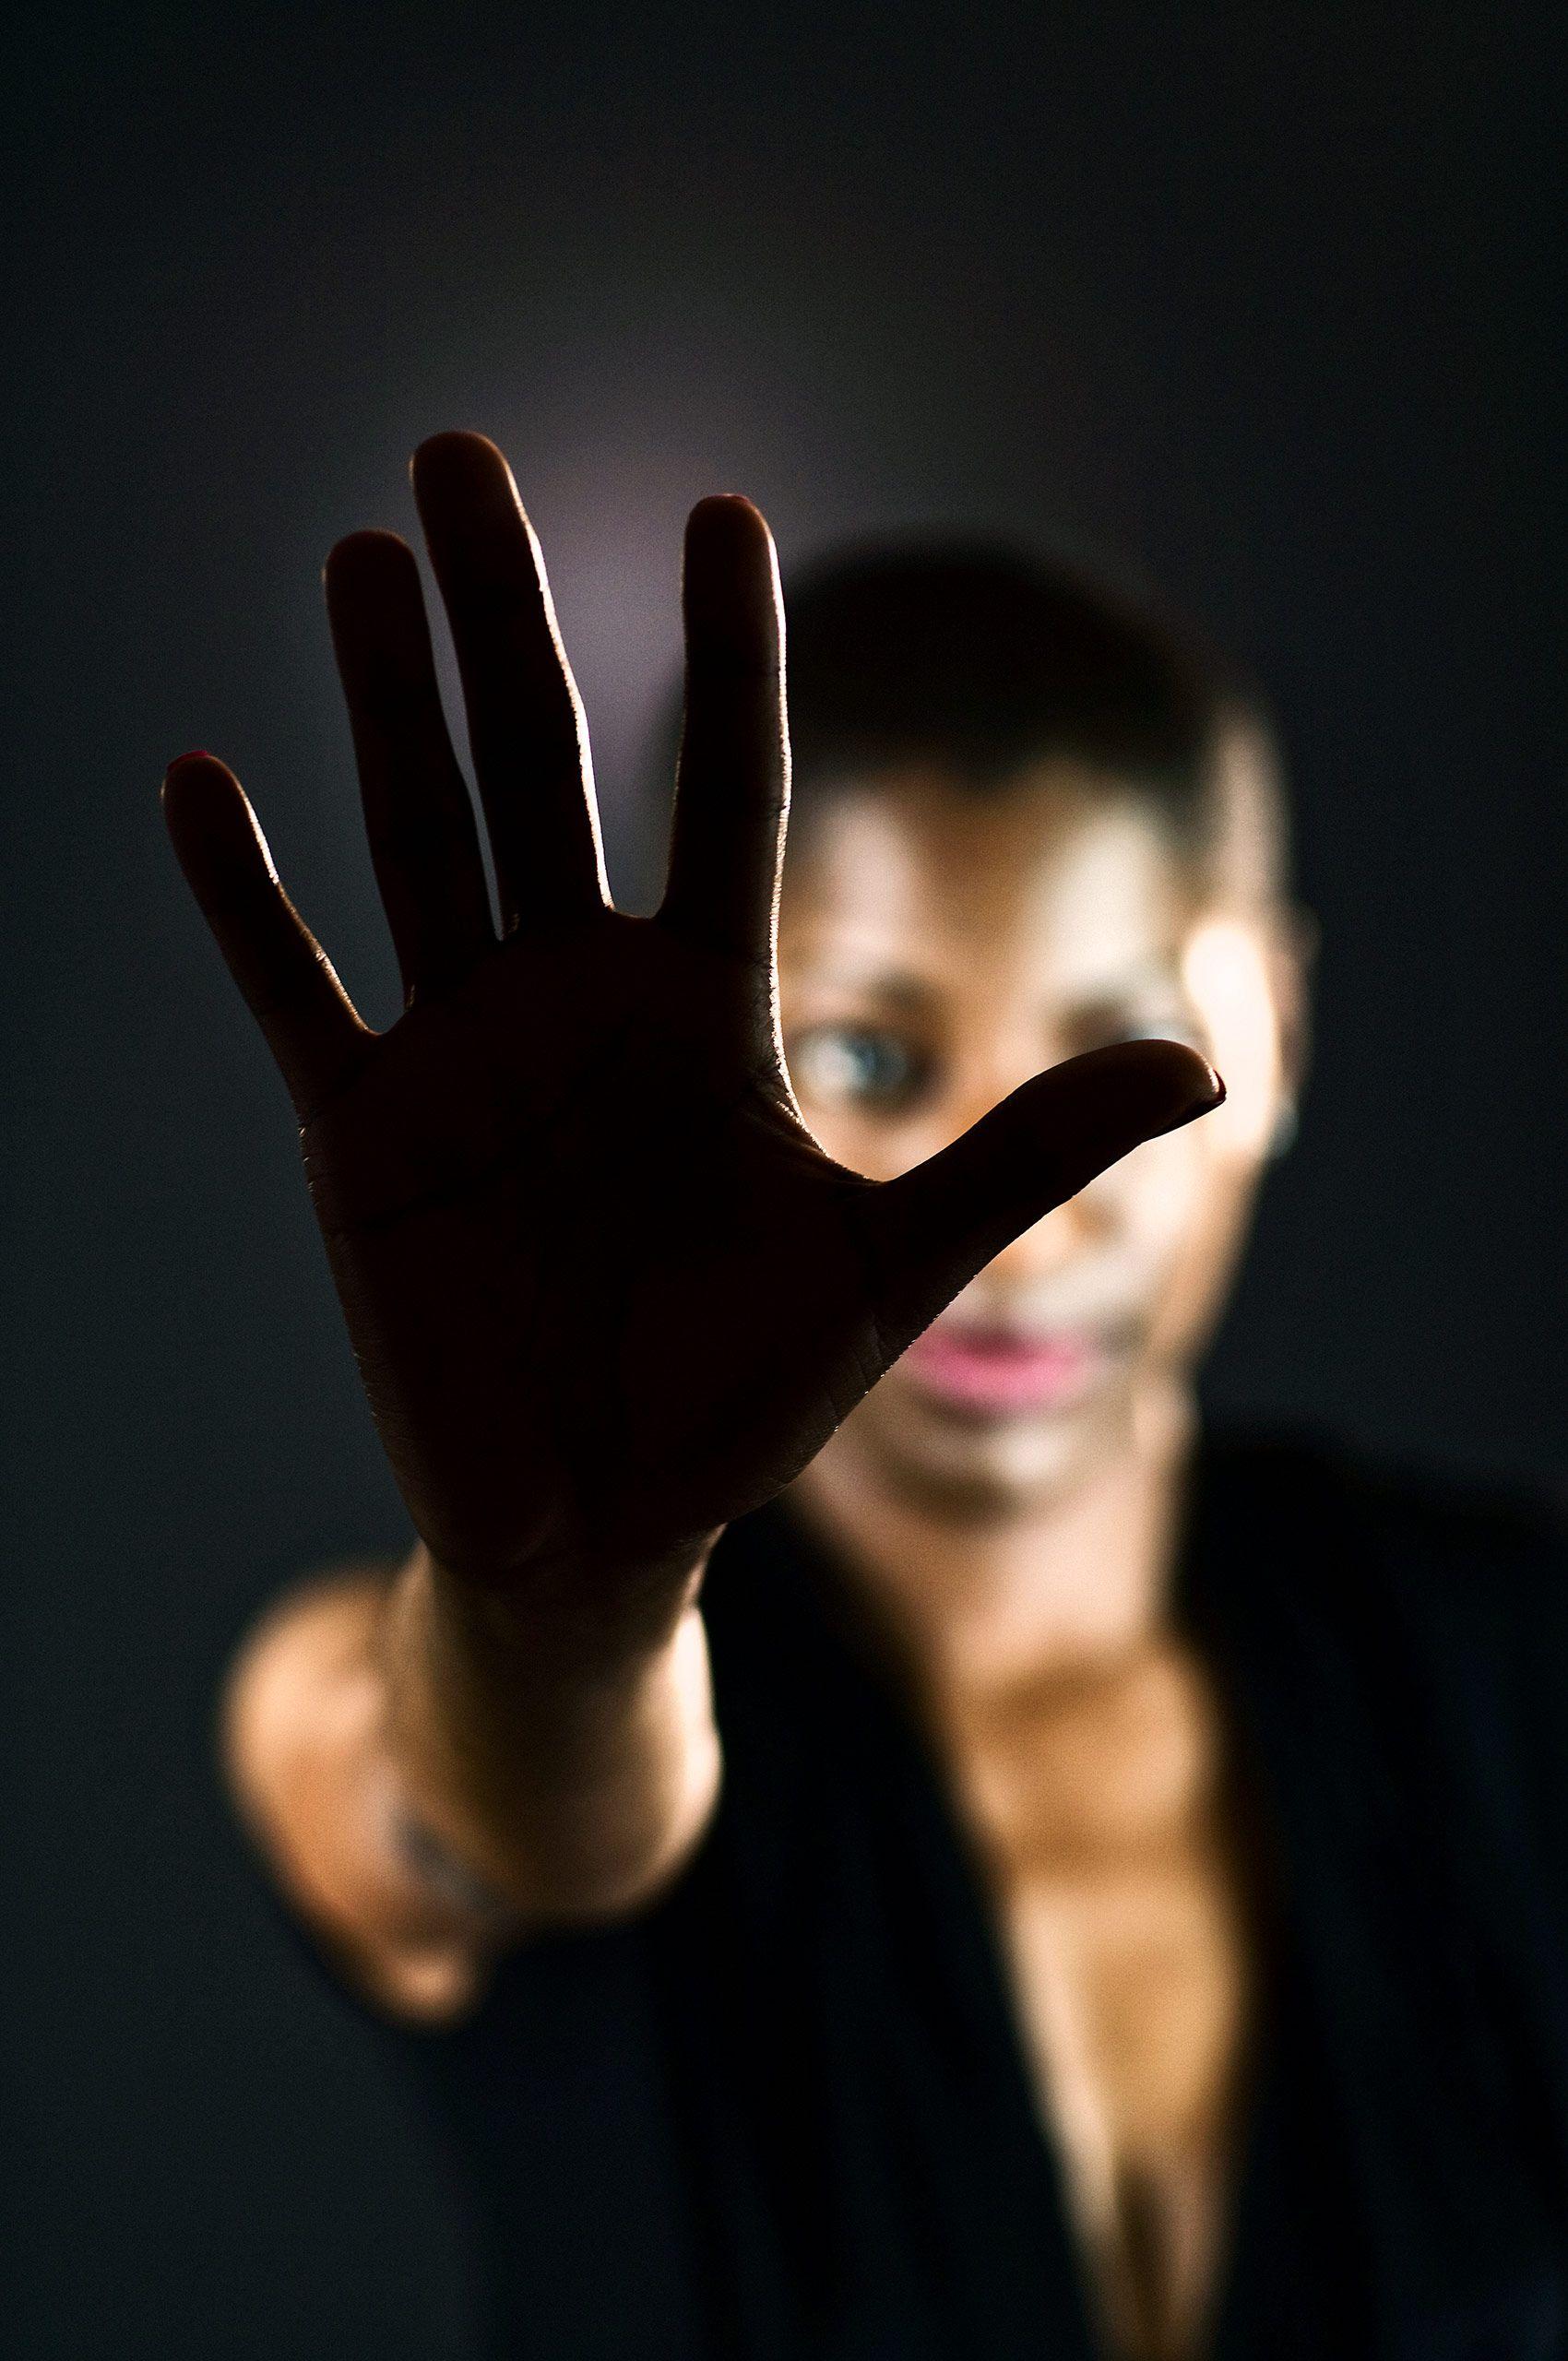 Hand-africanamerican-woman-HenrikOlundPhotography.jpg